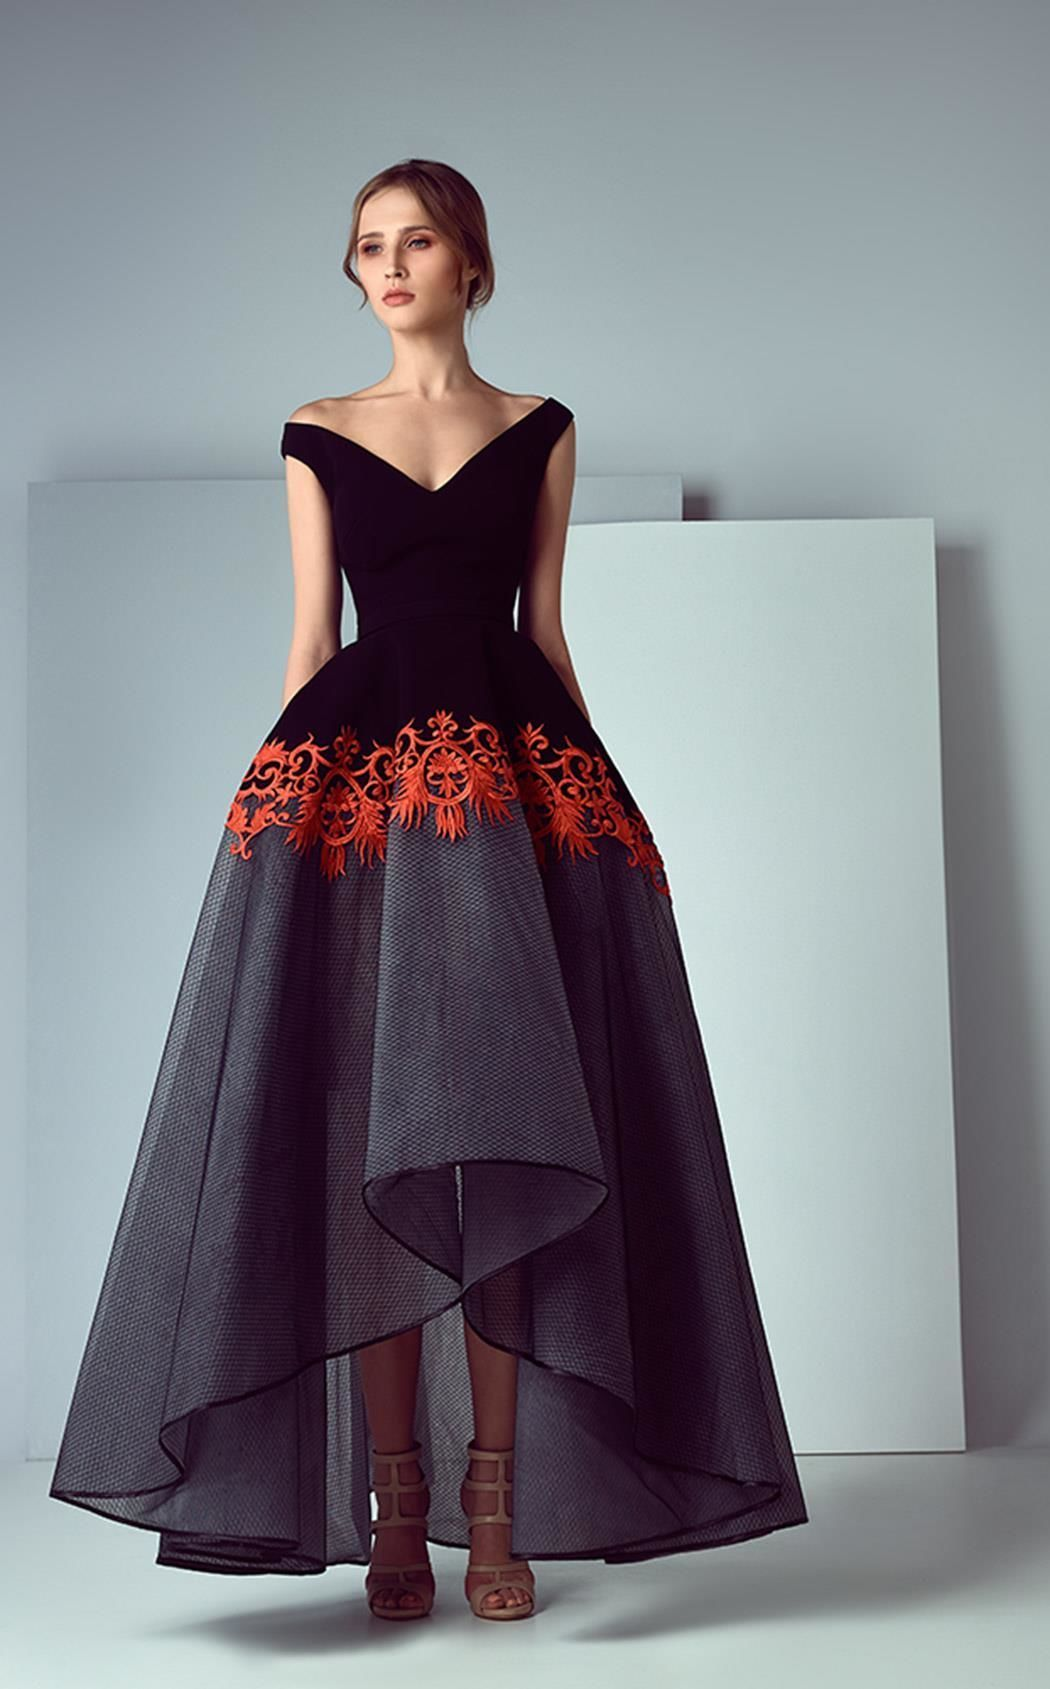 Amazing dresses by Saiid Kobeisy trapitos Pinterest Dresses